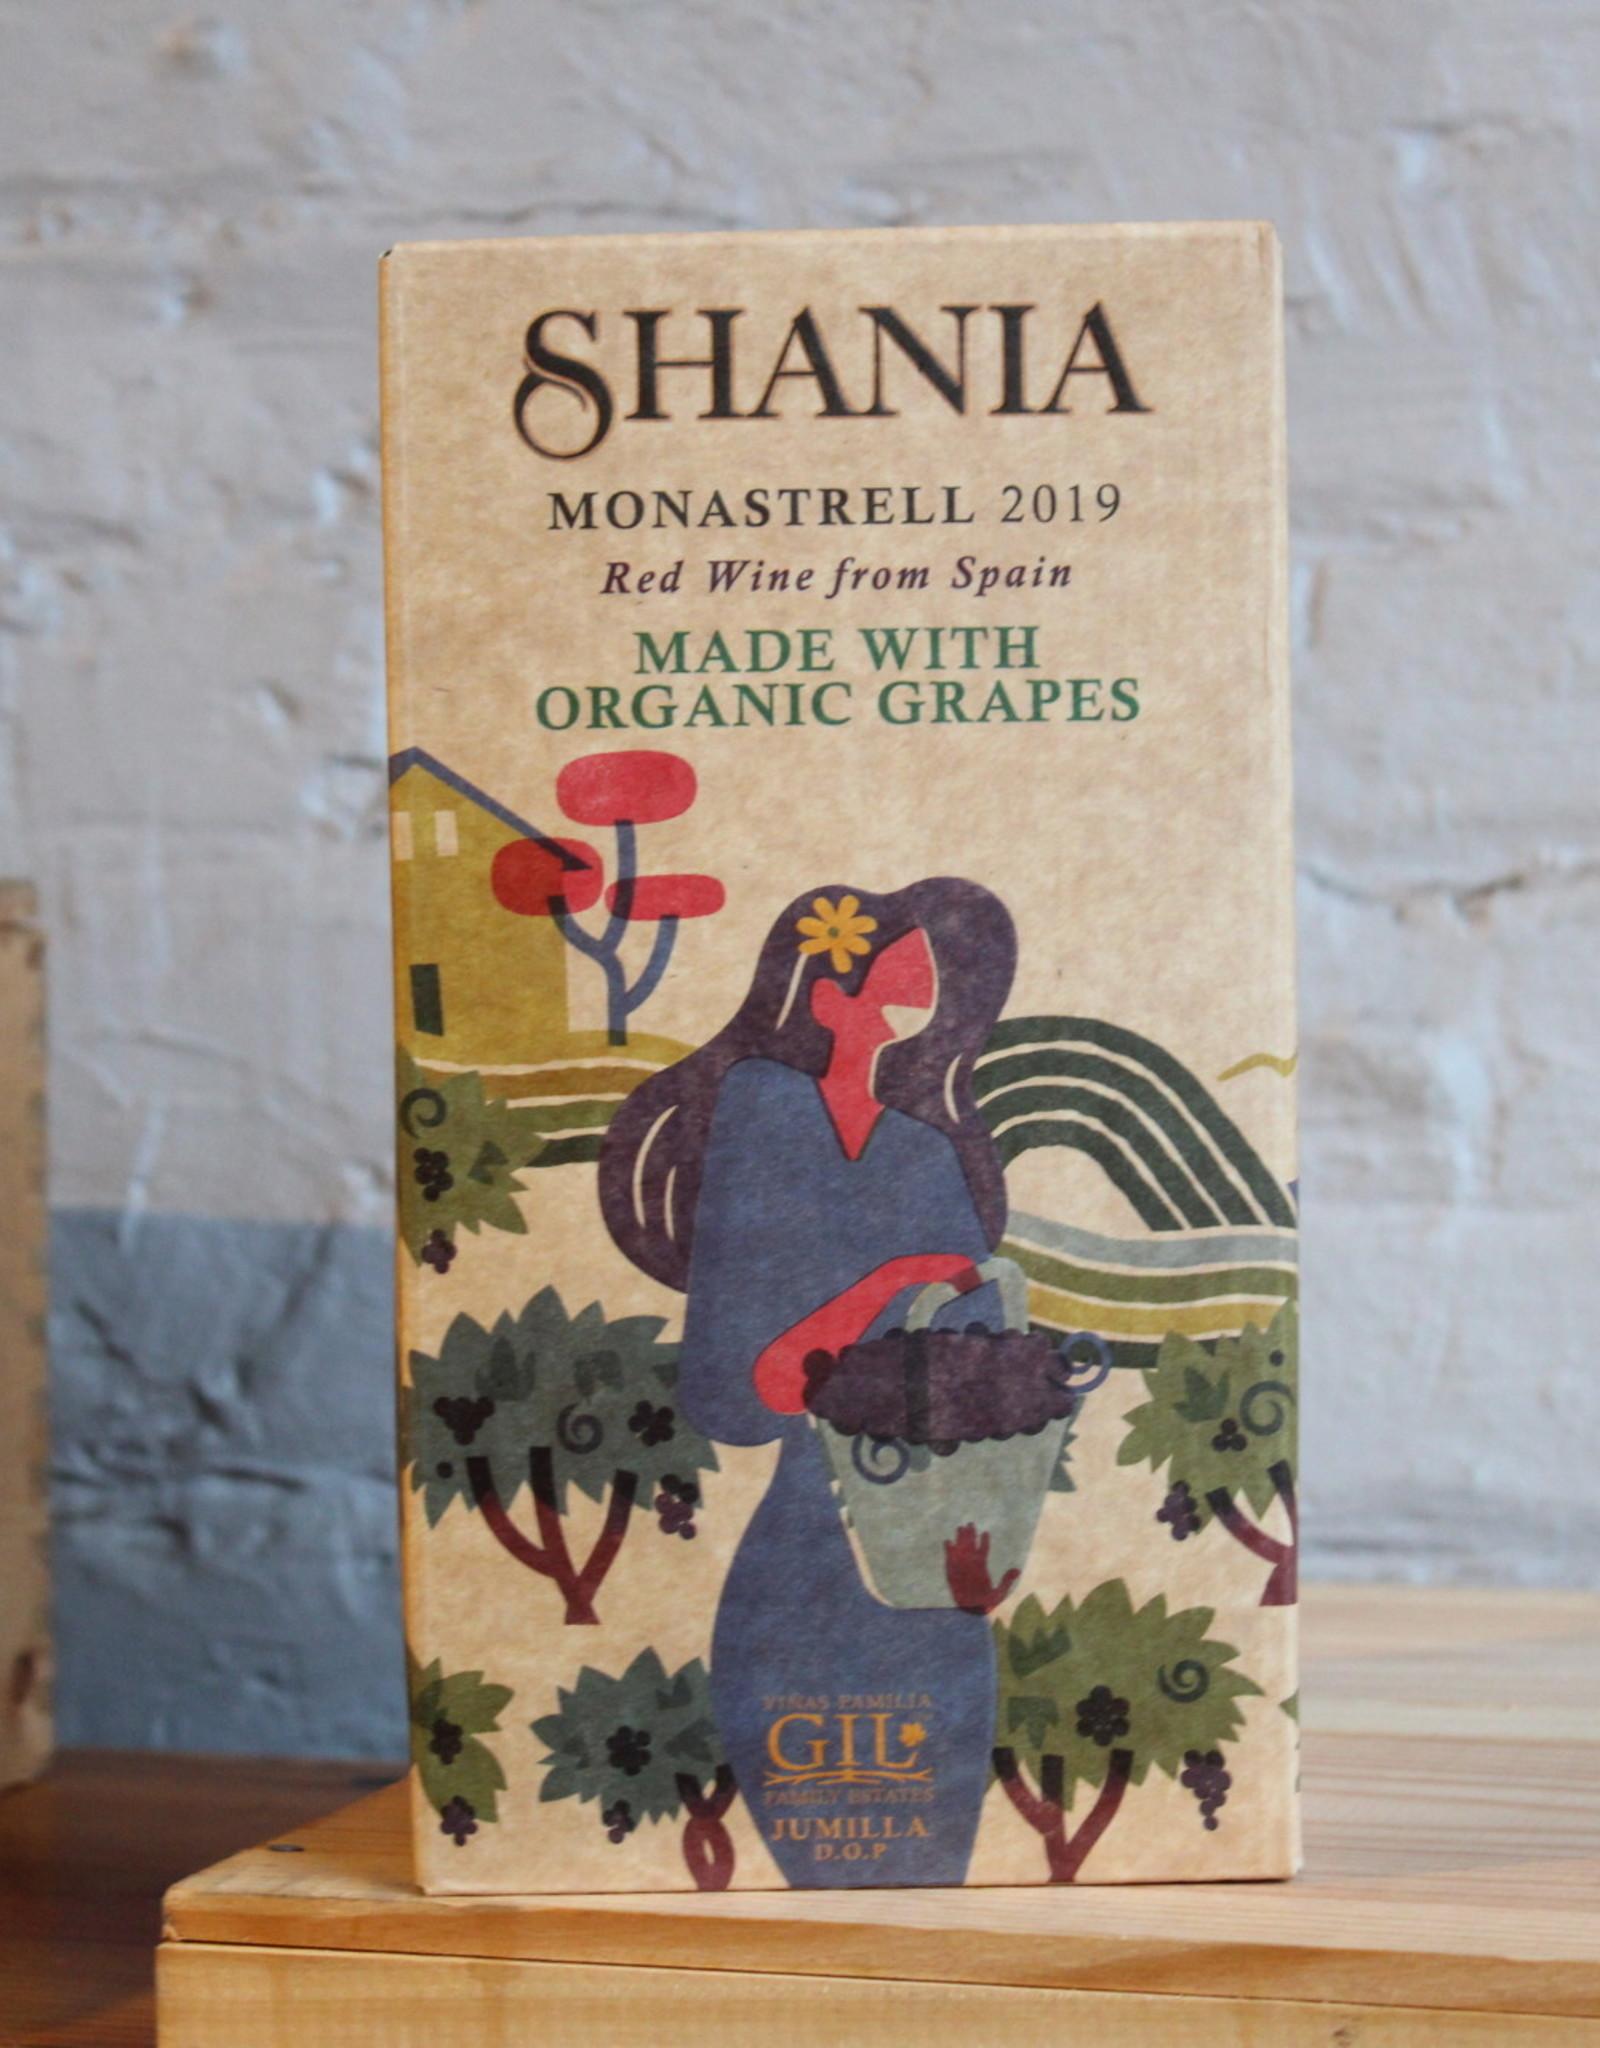 Wine 2020 Bodegas Hijos de Juan Gil, Shania Monastrell - Murcia, Spain (3Ltrs Bag-in-a-Box)